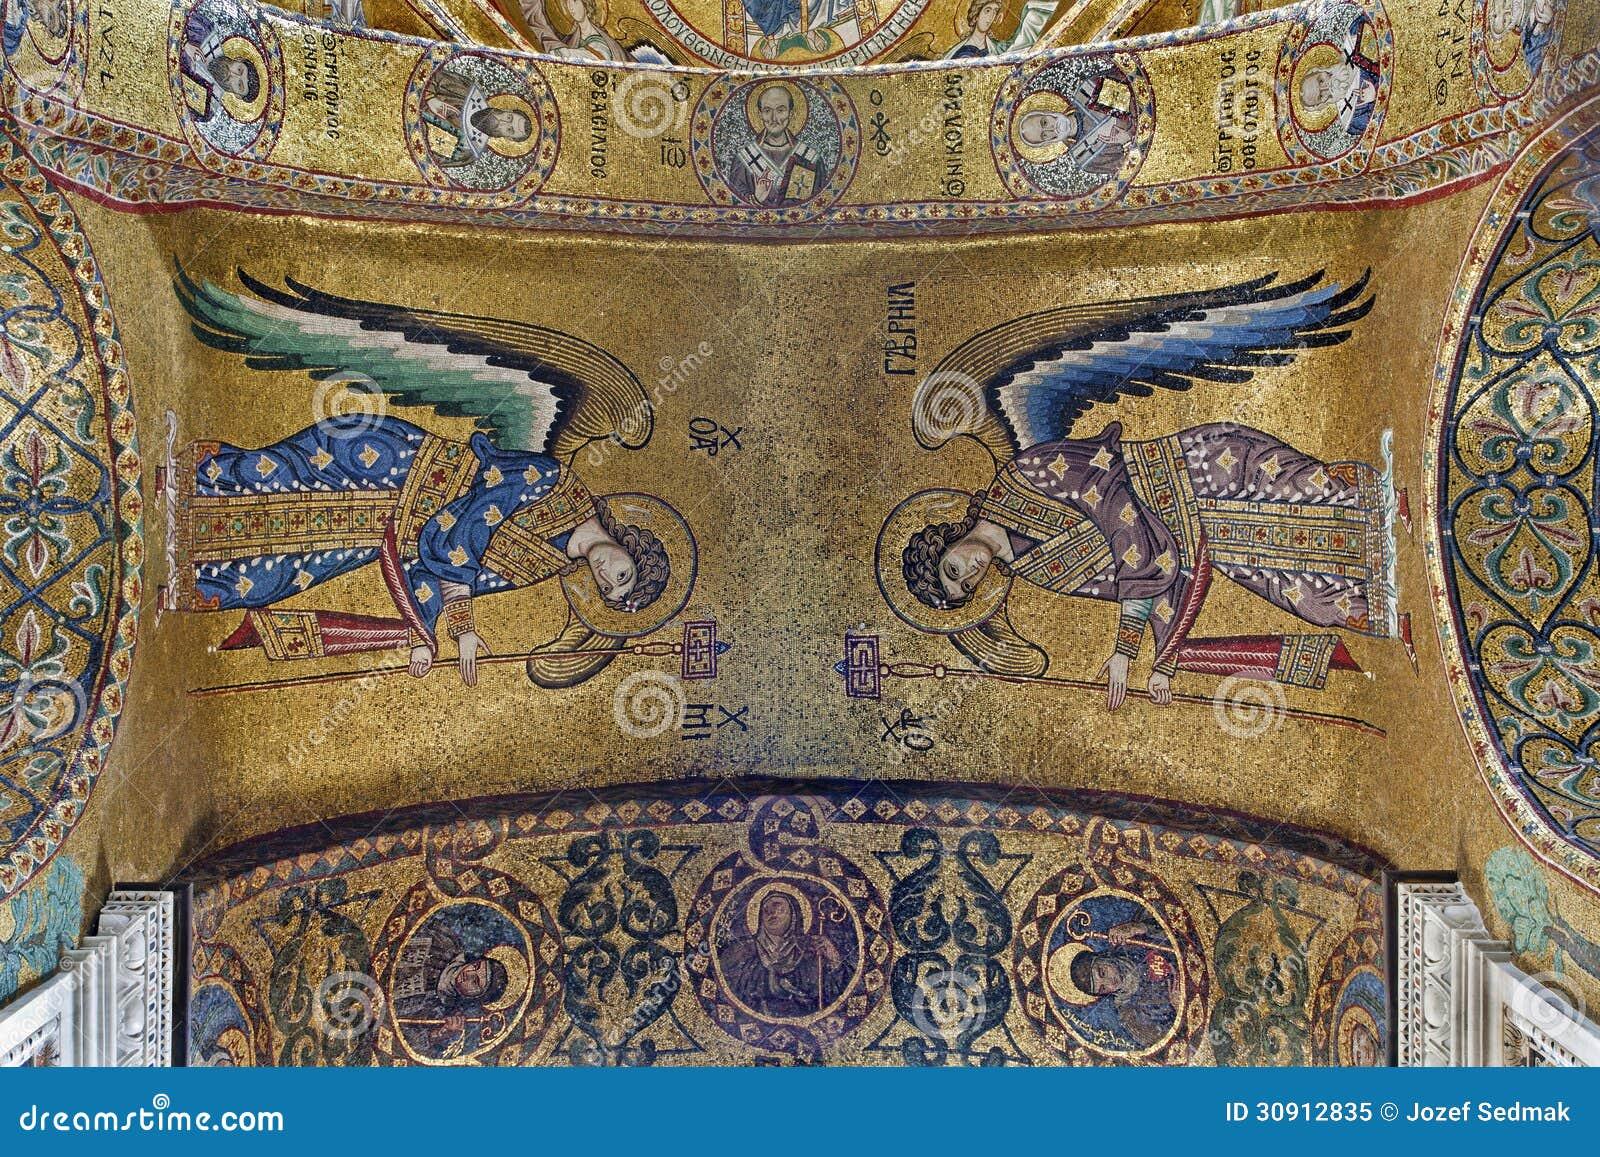 Palermo - Mozaïek van Aartsengel Michael en Gabriel van plafond in Kerk van Santa Maria dell Ammiraglio